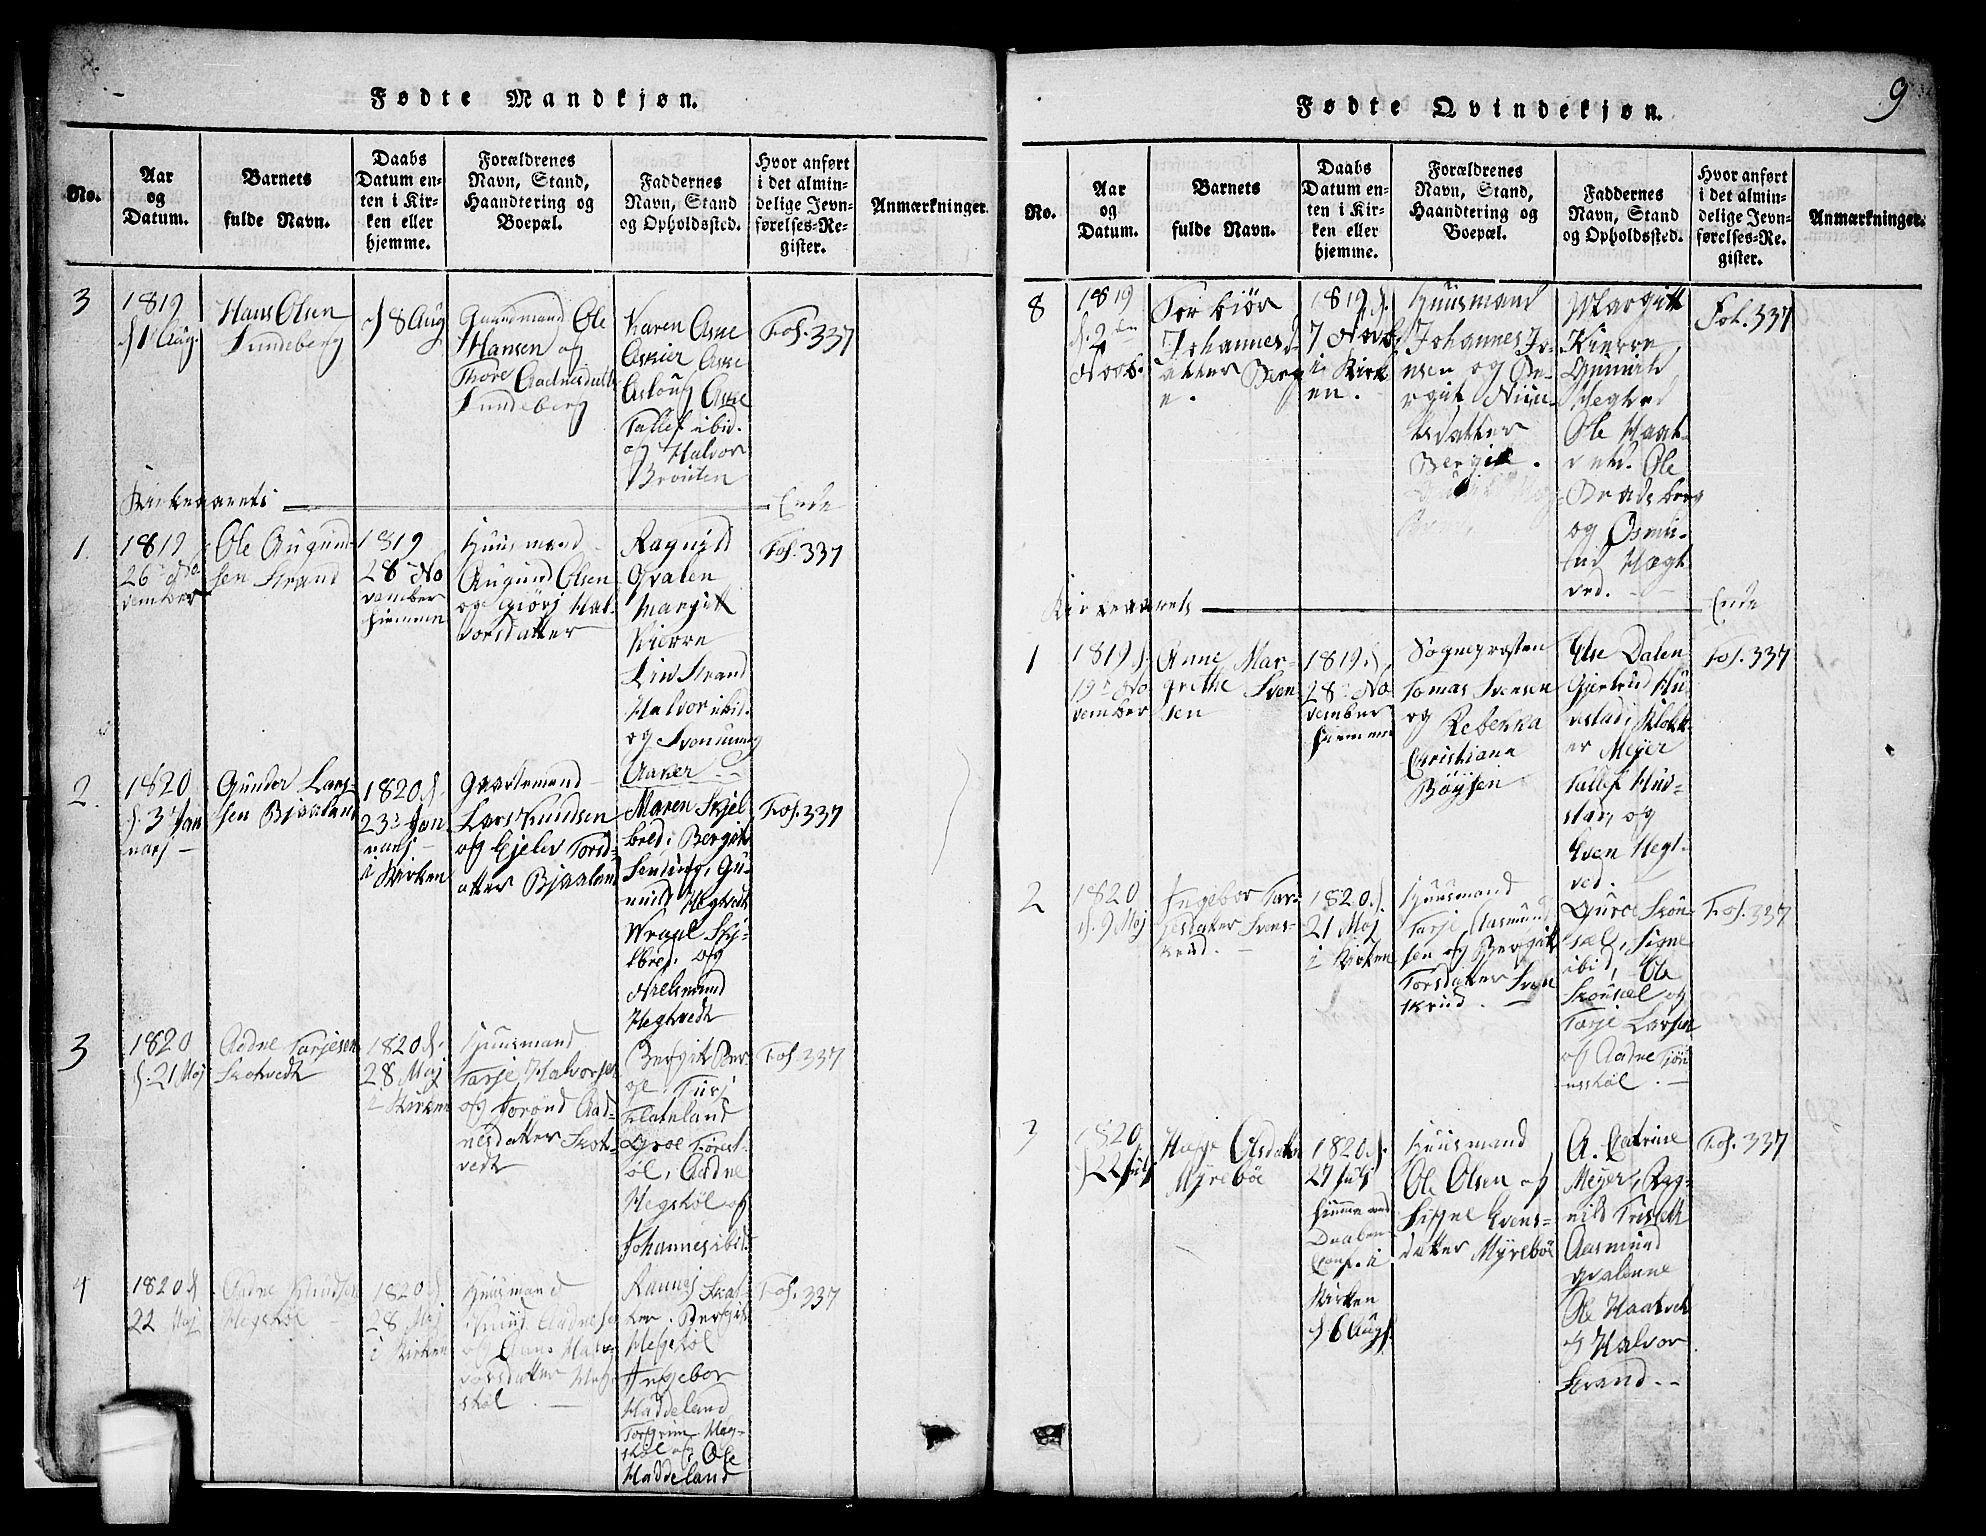 SAKO, Lårdal kirkebøker, G/Ga/L0001: Klokkerbok nr. I 1, 1815-1861, s. 9